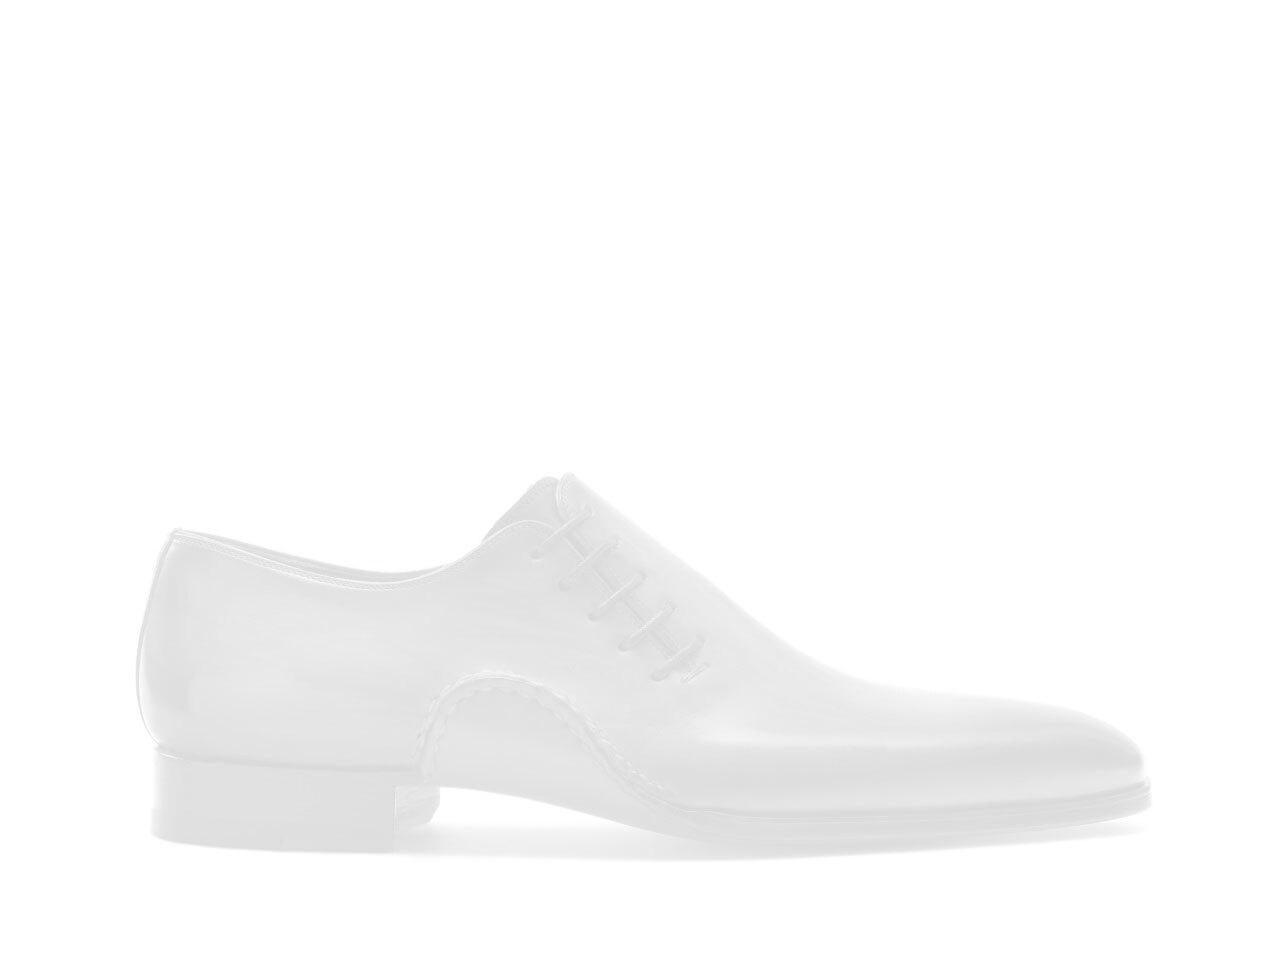 Pair of the Magnanni Feroz Midbrown Suede Men's Designer Boots